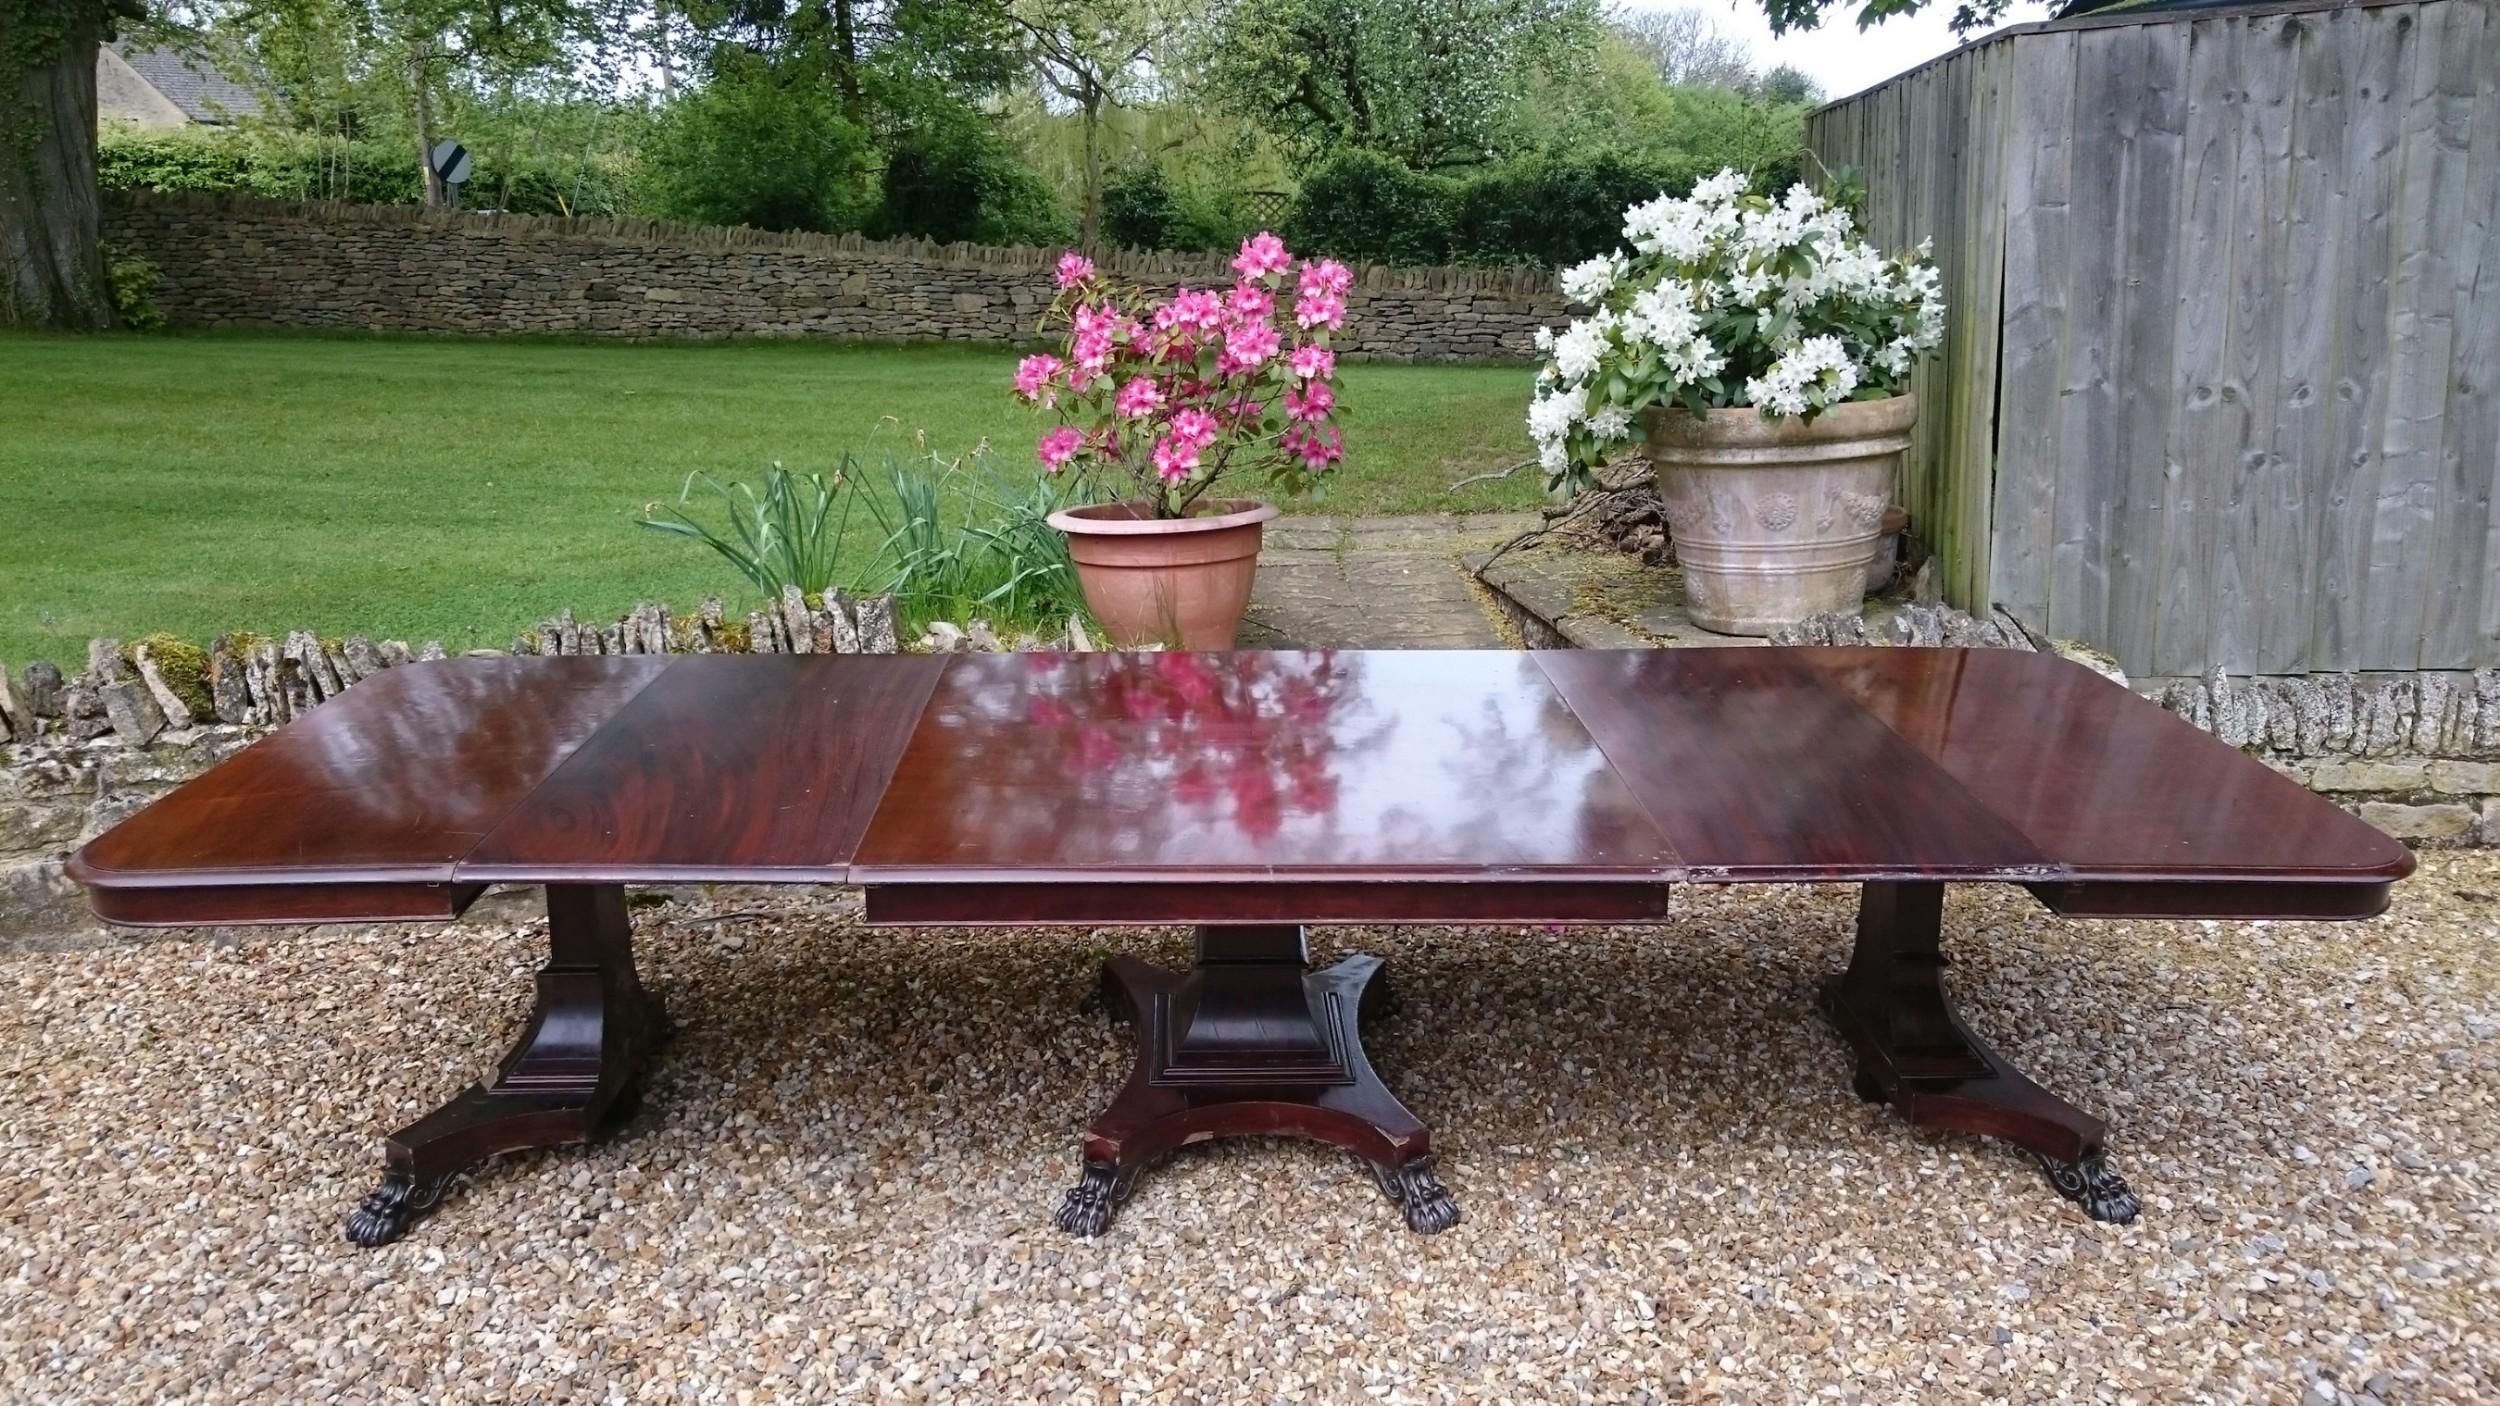 19th century antique three pedestal dining table